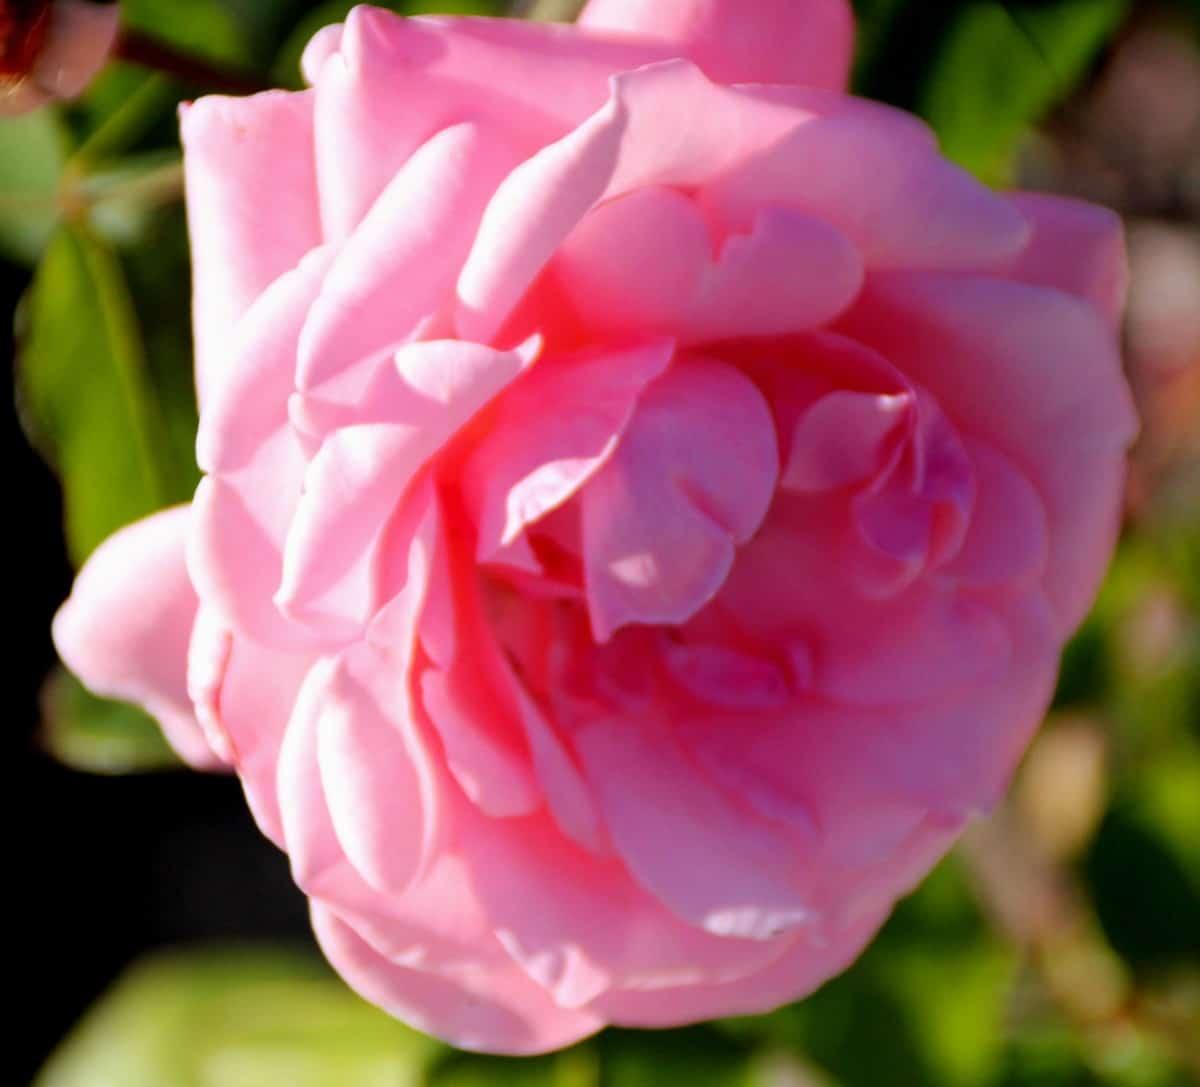 grandiflora rose bushes have multiple blooms on each stem